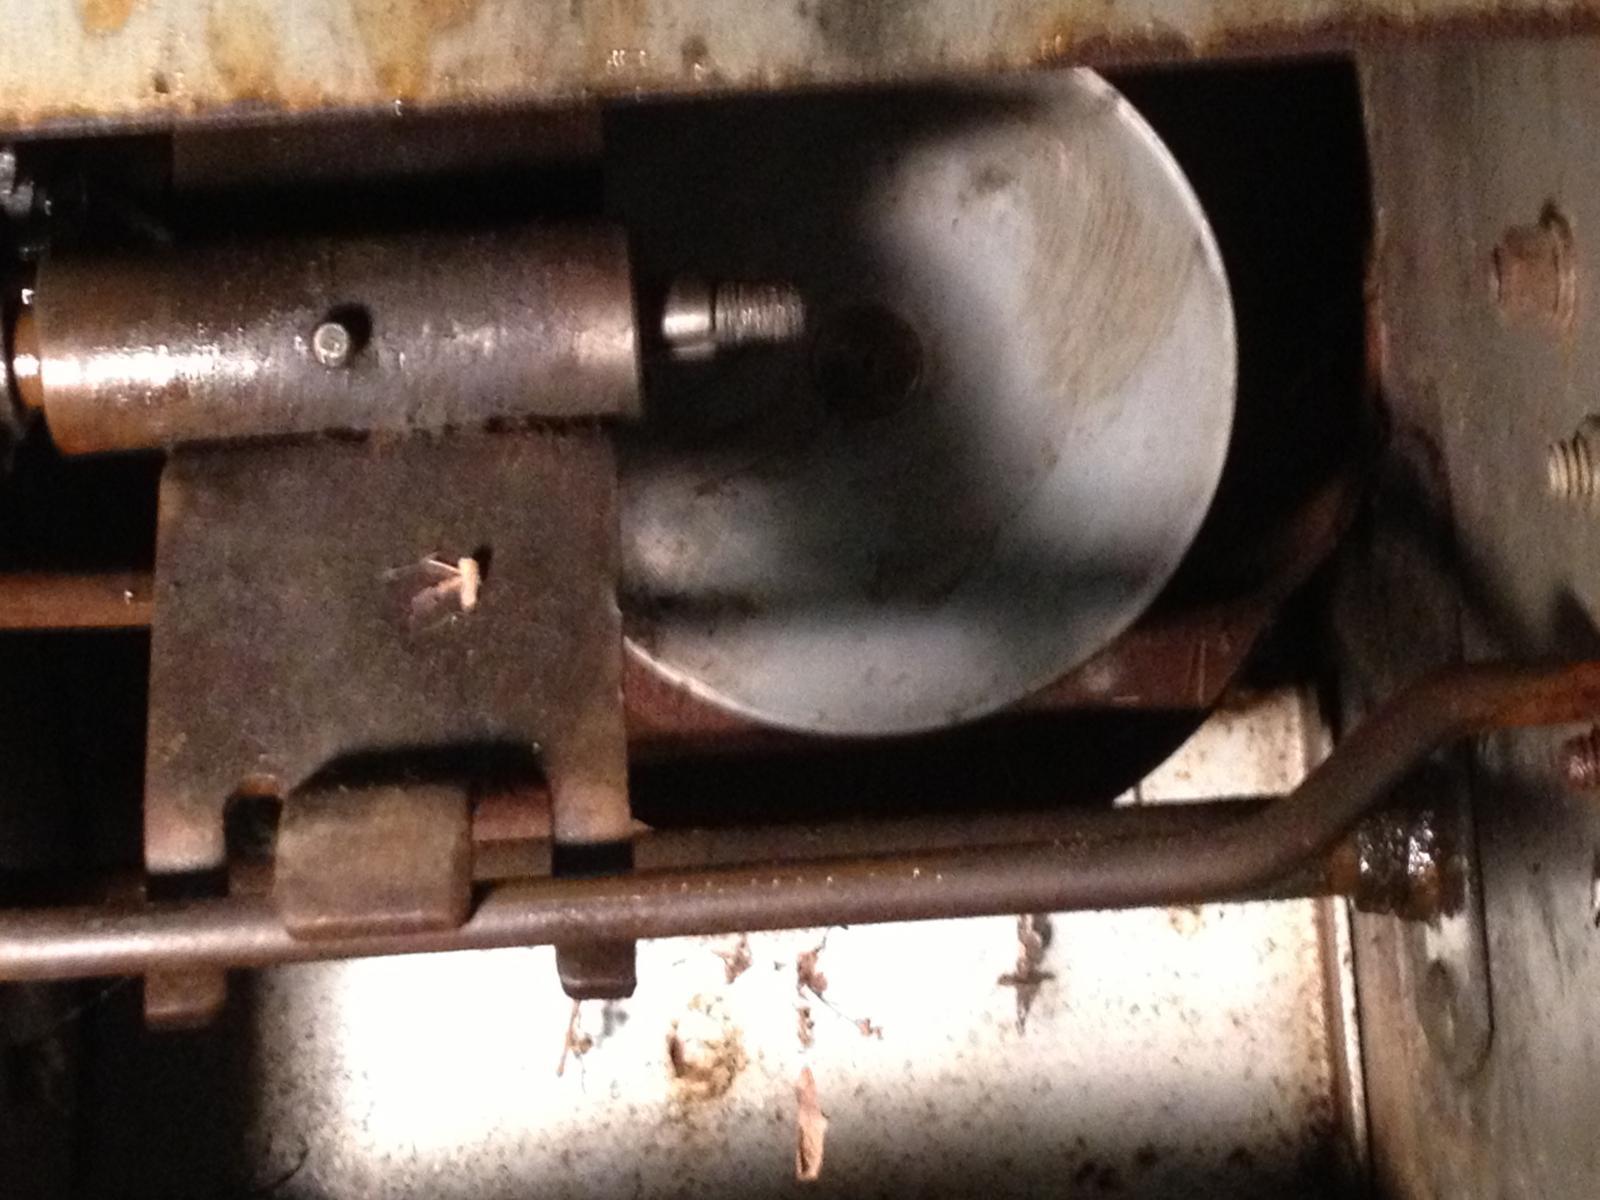 Craftsman 10/32 manual needed C950 52670-photo2.jpg